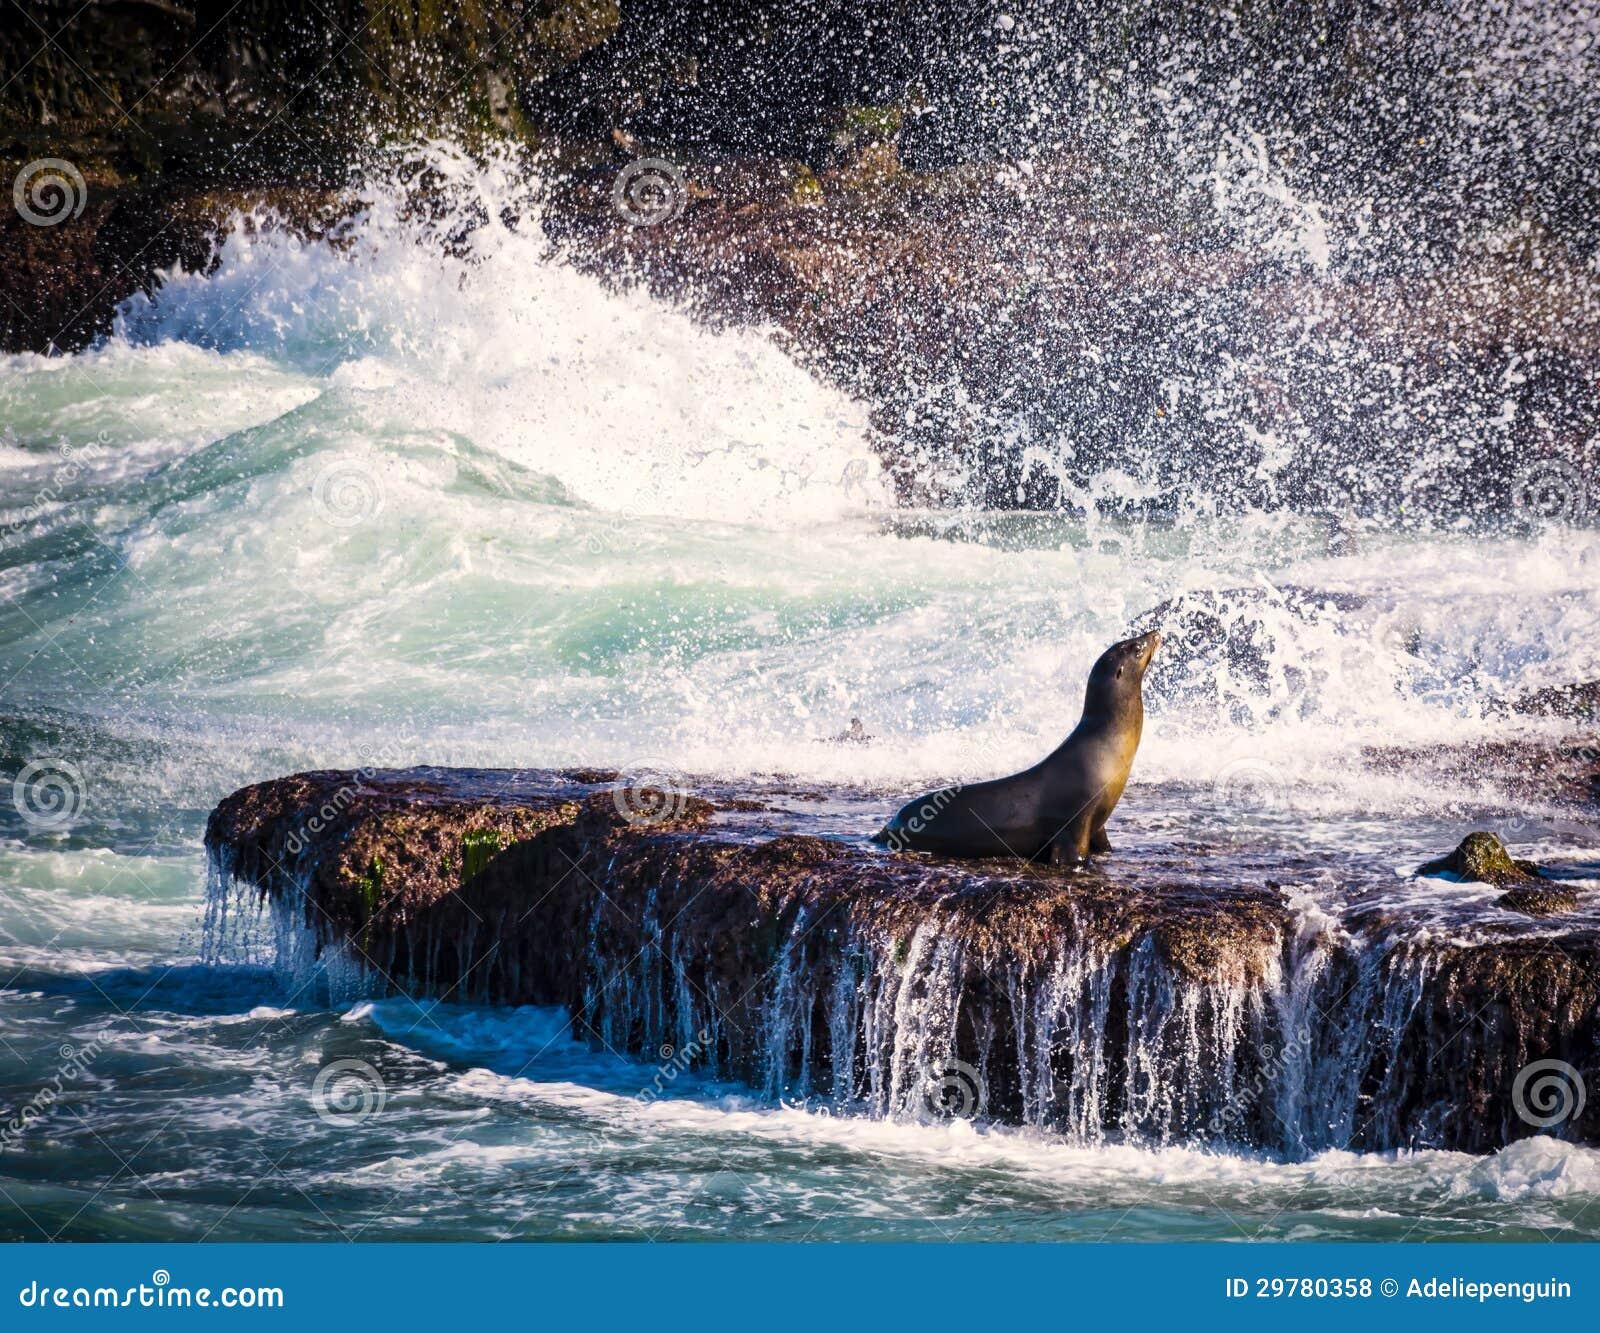 Sea Lion, Surf, La Jolla, California